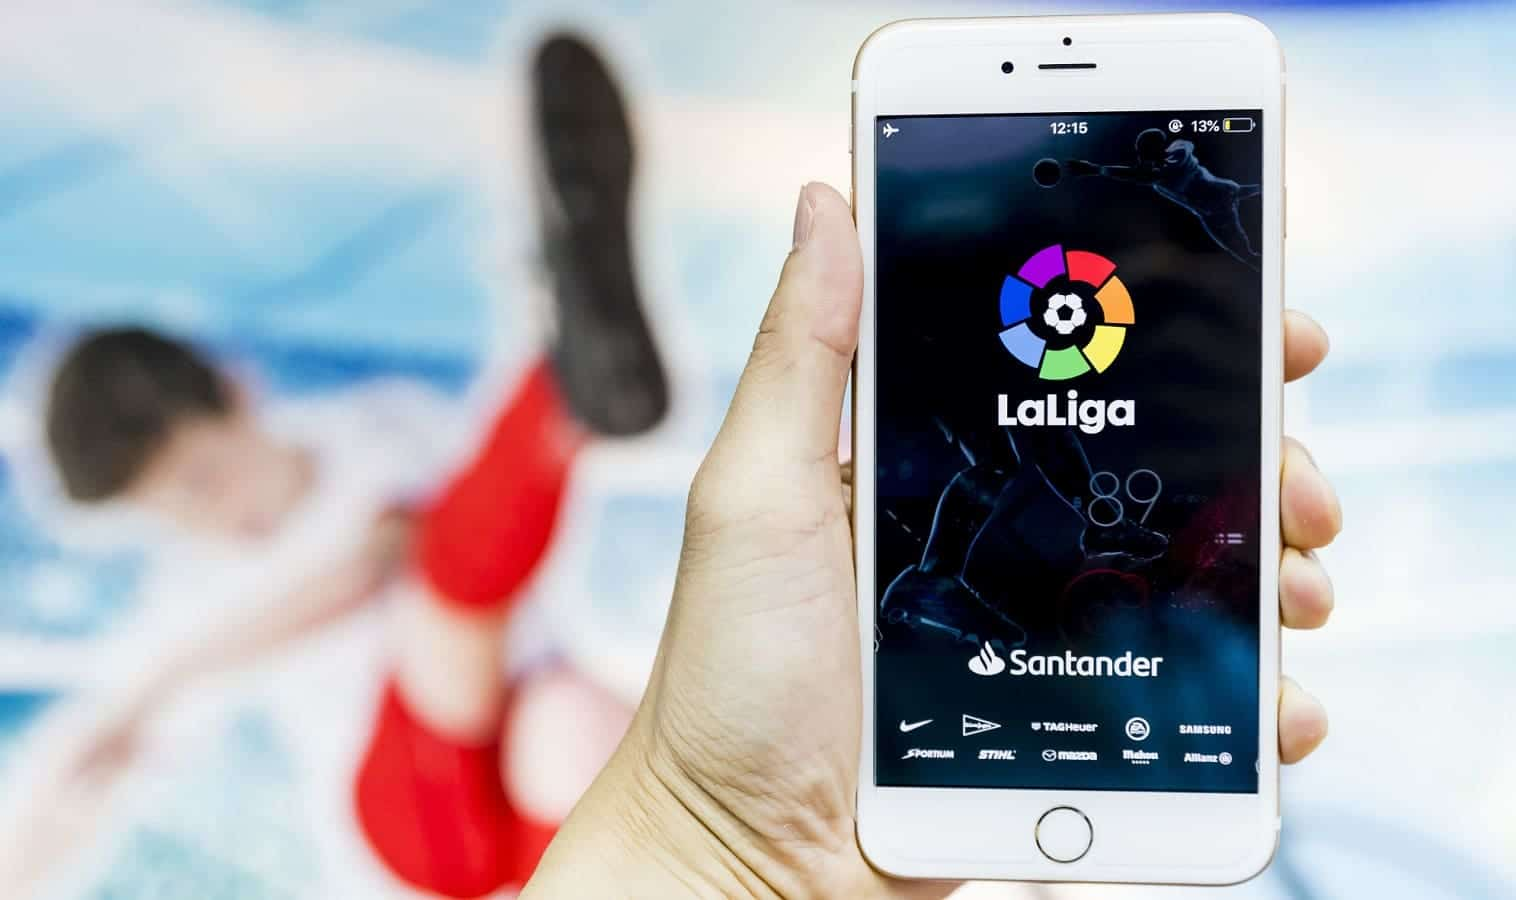 la liga soccer app on phone